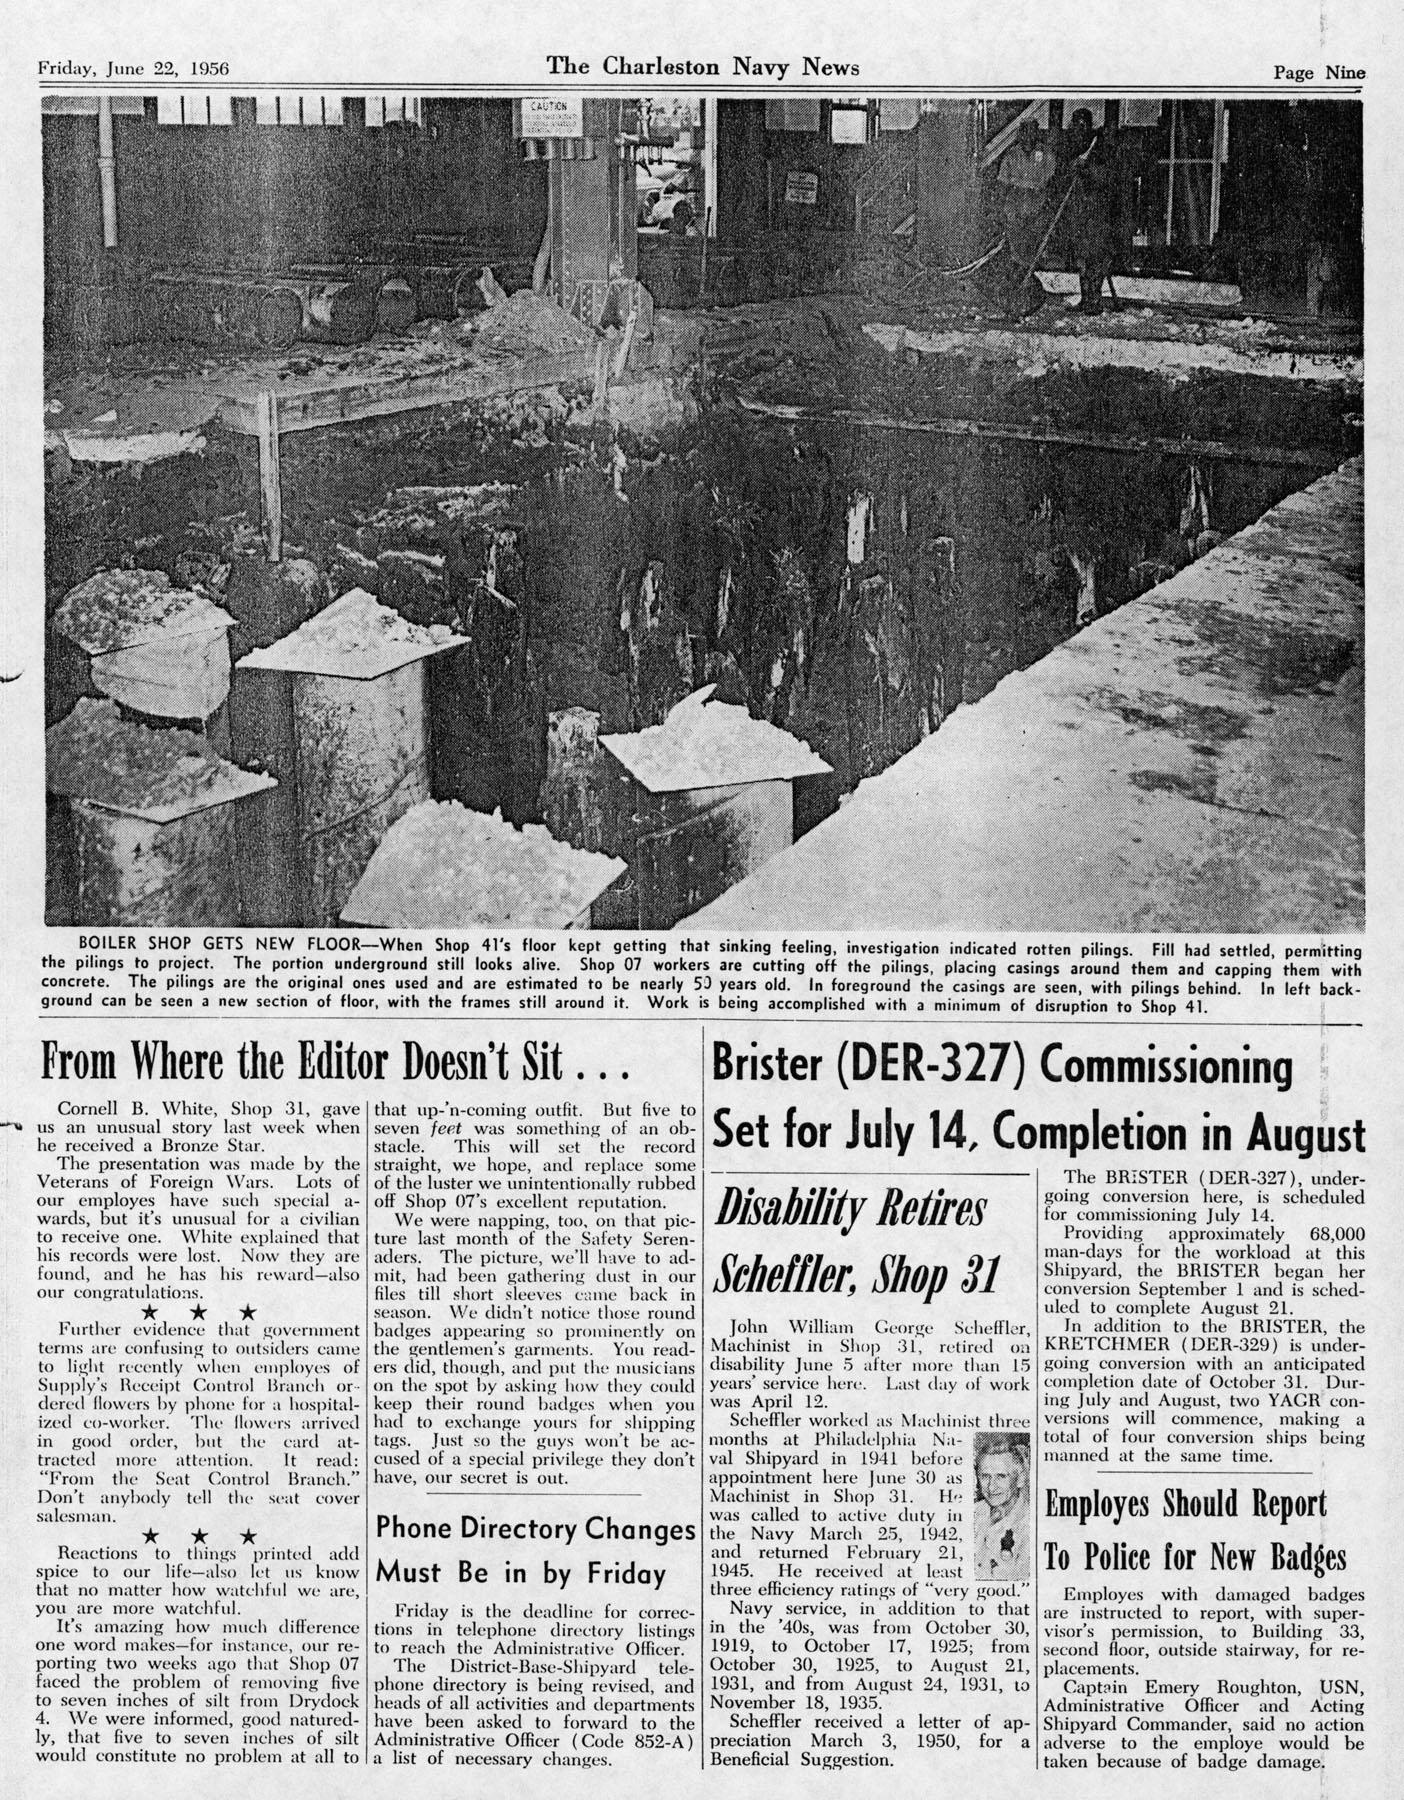 The Charleston Navy News, Volume 14, Edition 24, page ix